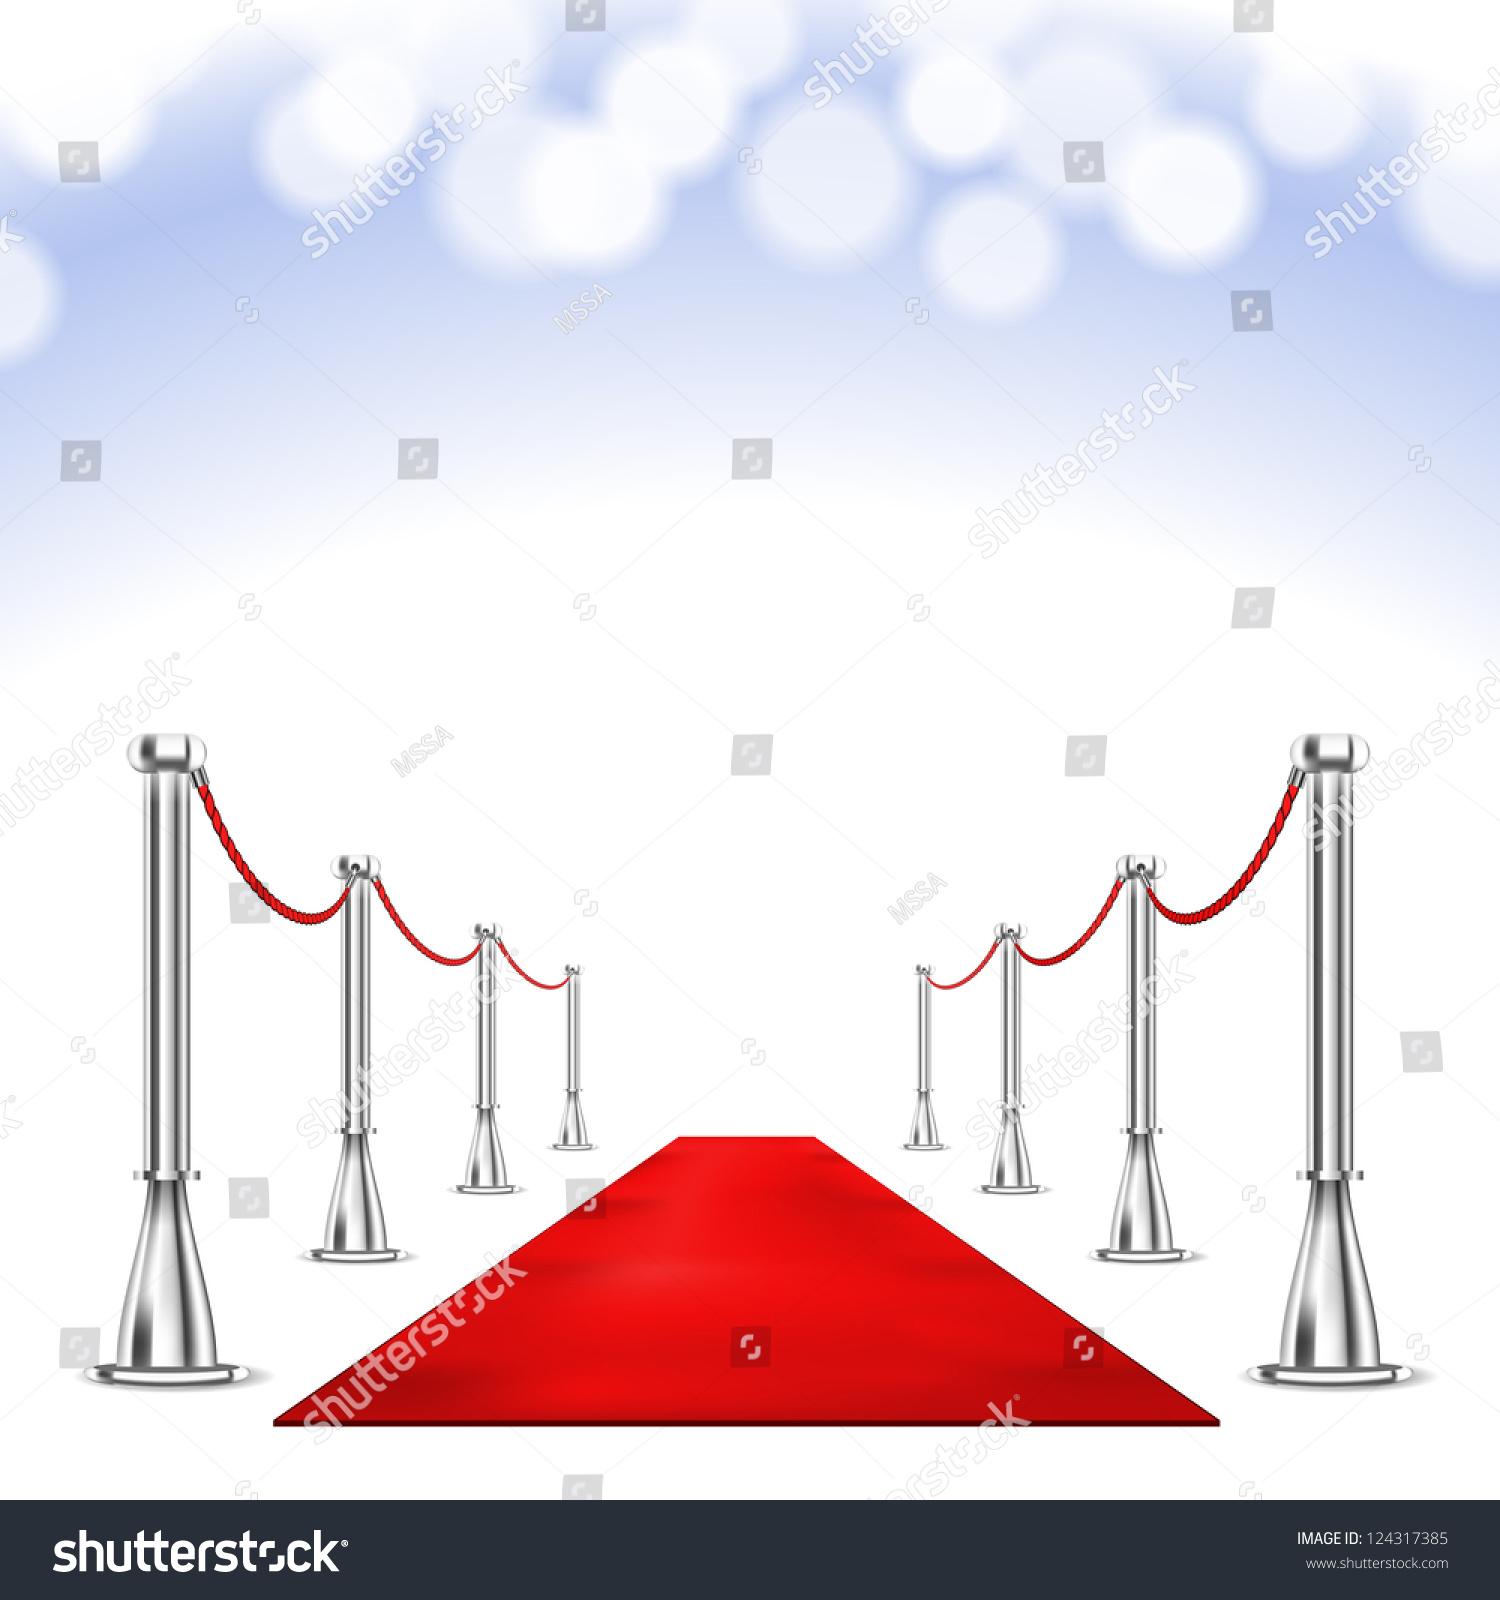 Camila Alves and Matthew McConaughey on Oscars red carpet